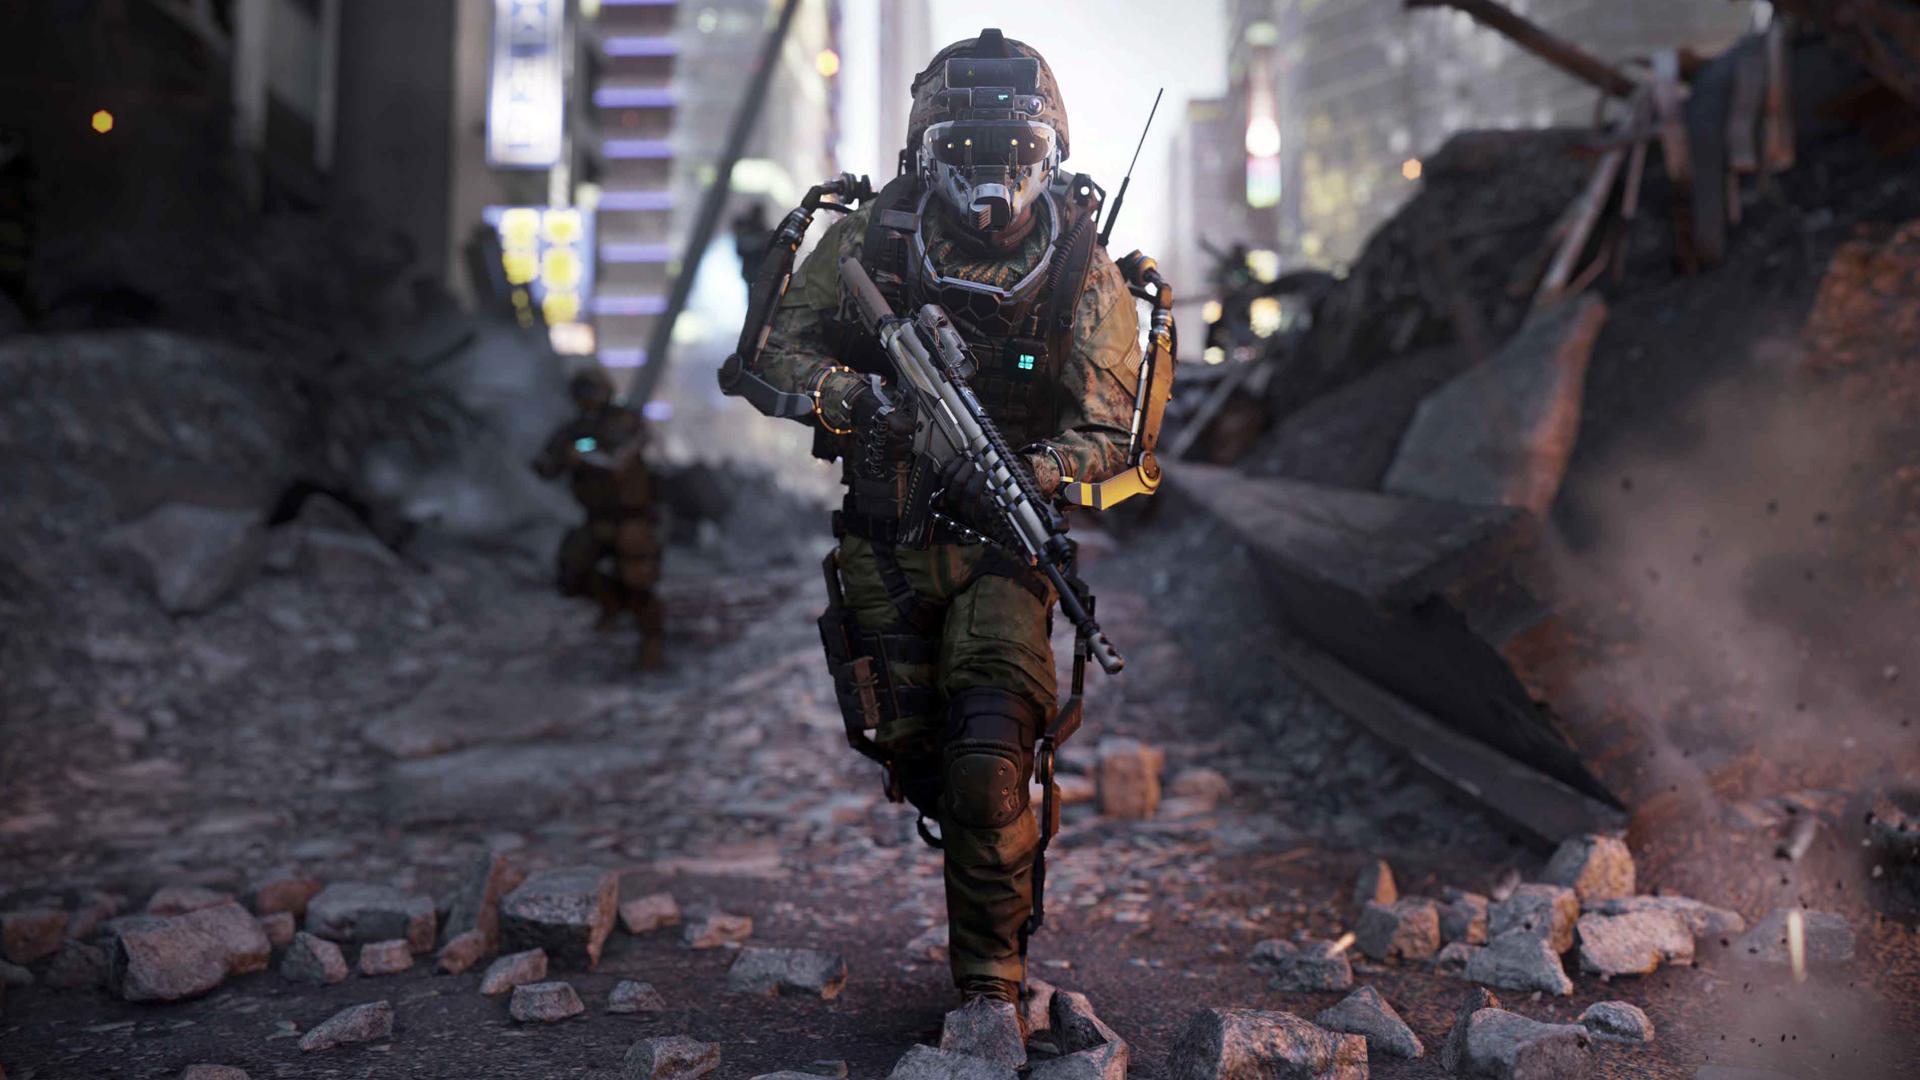 Call-Of-Duty-Advanced-Warfare-HD-Backgrounds-wallpaper-wp3401428